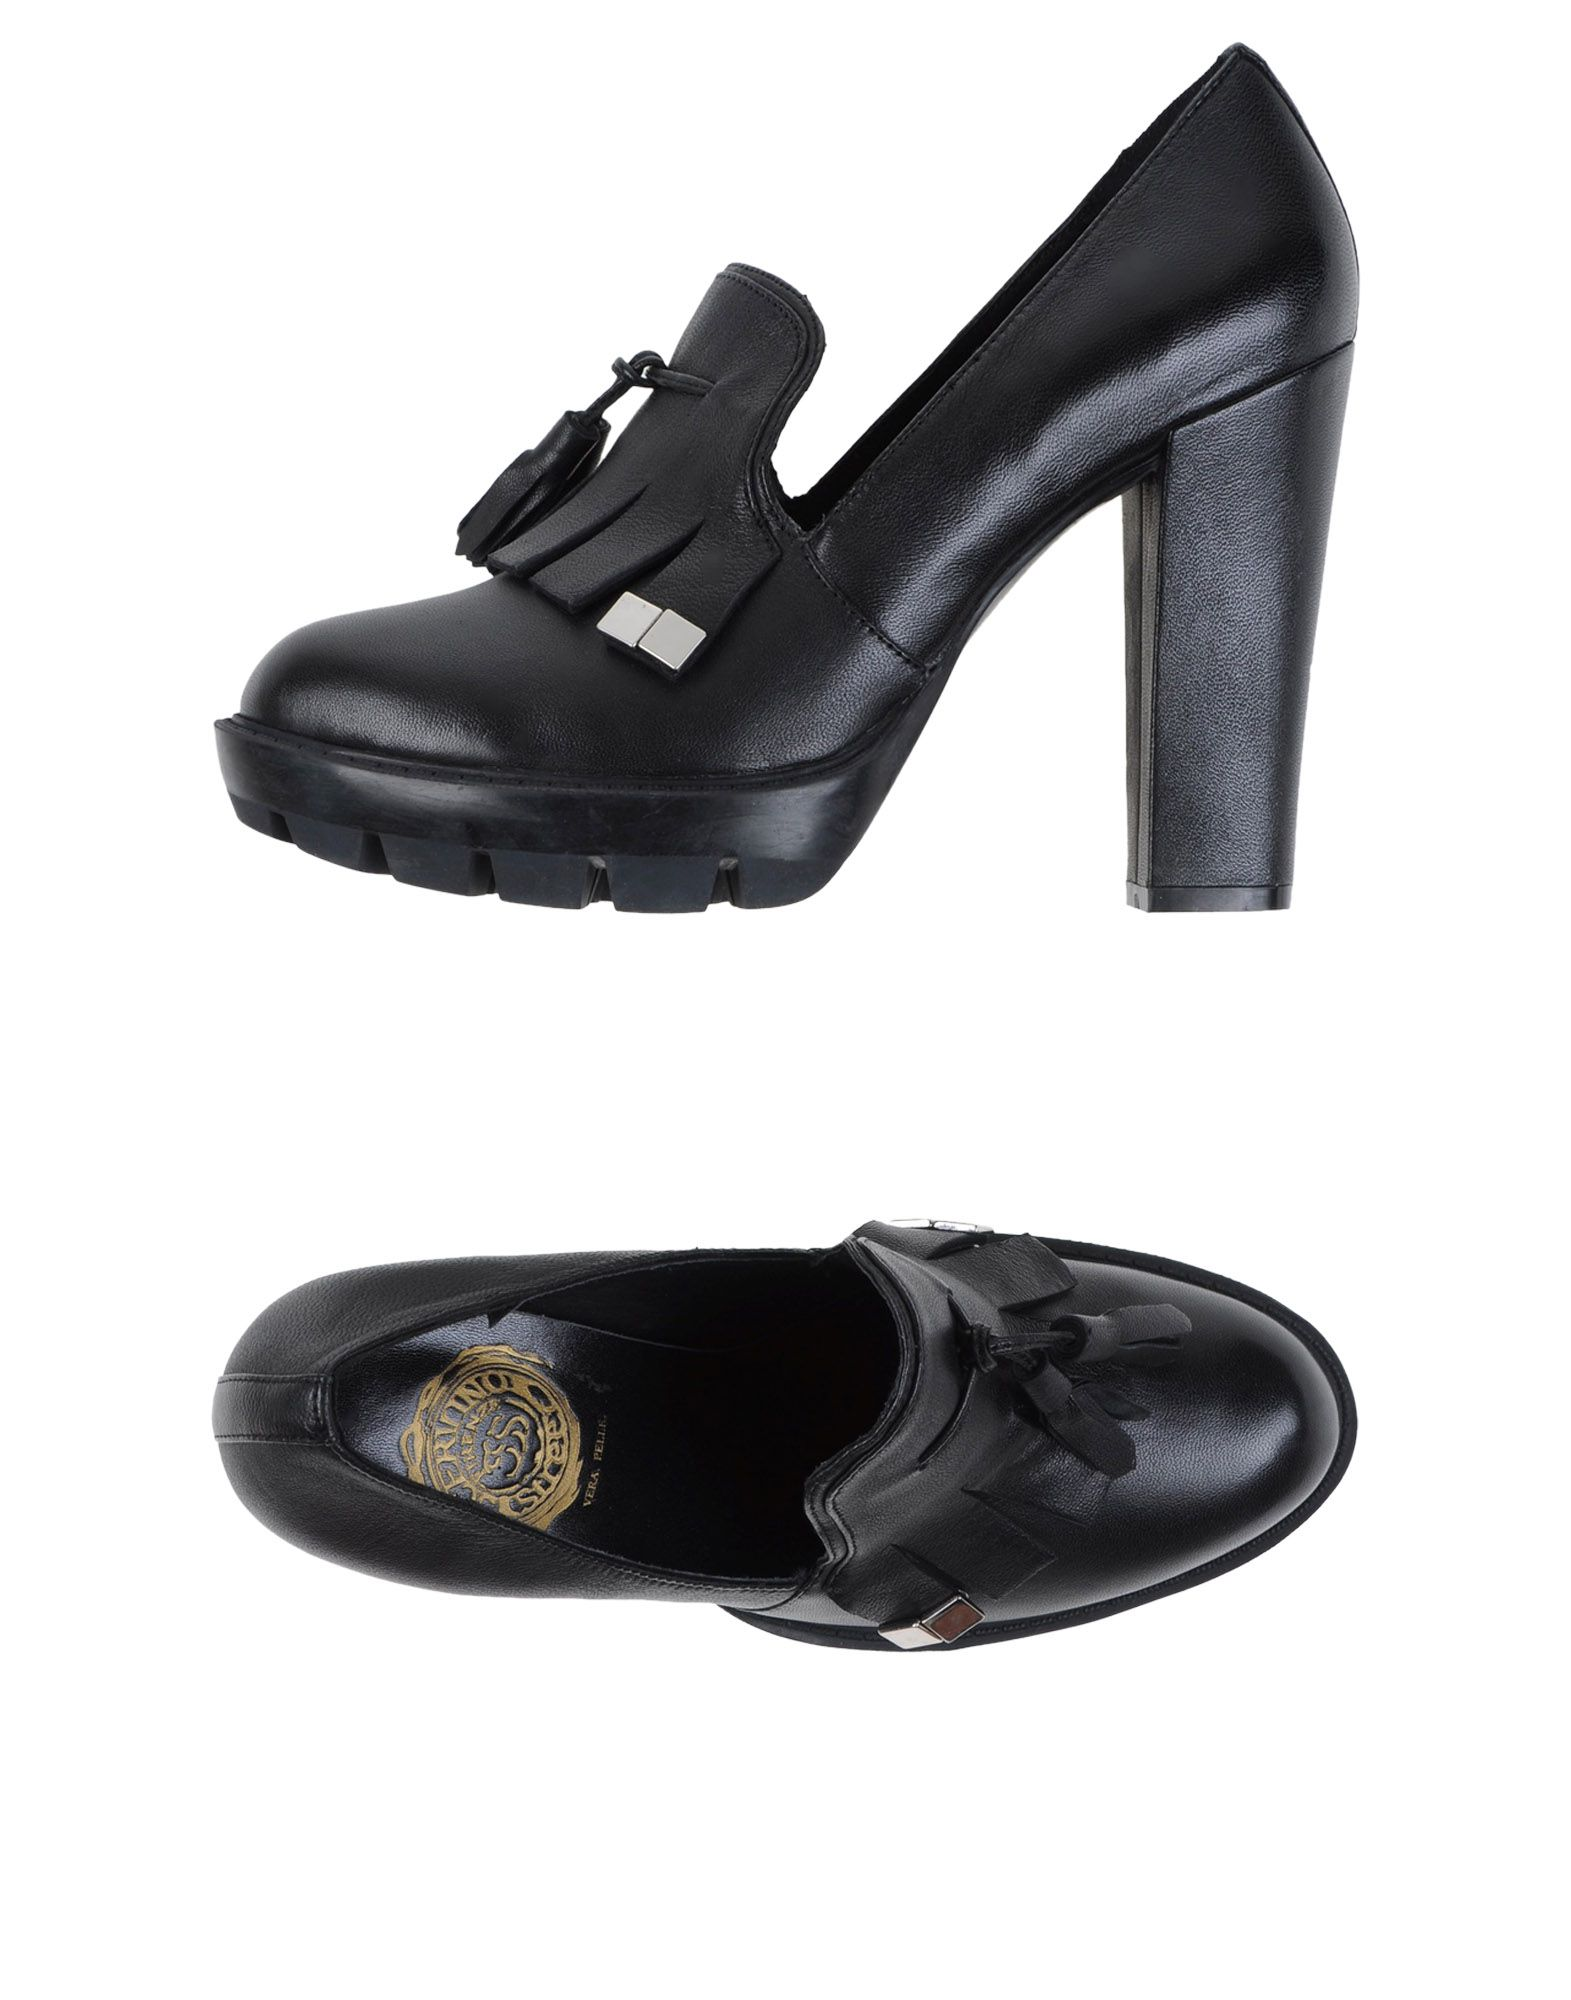 Stilvolle billige Schuhe Scervino Street Mokassins Damen  11069709ML 11069709ML 11069709ML b4cc62